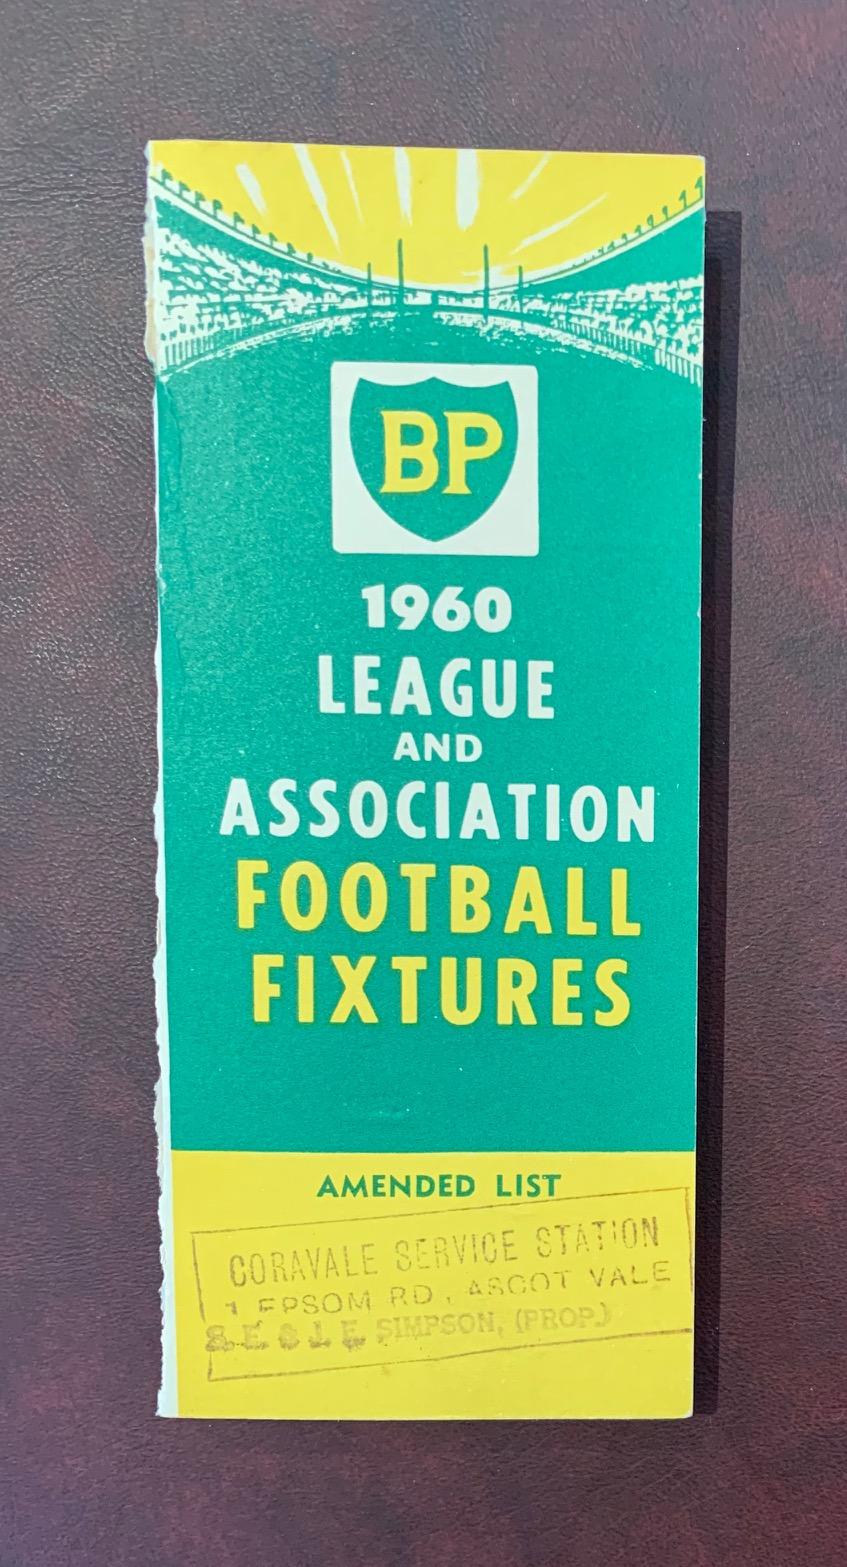 1960 B.P. Football Fixture